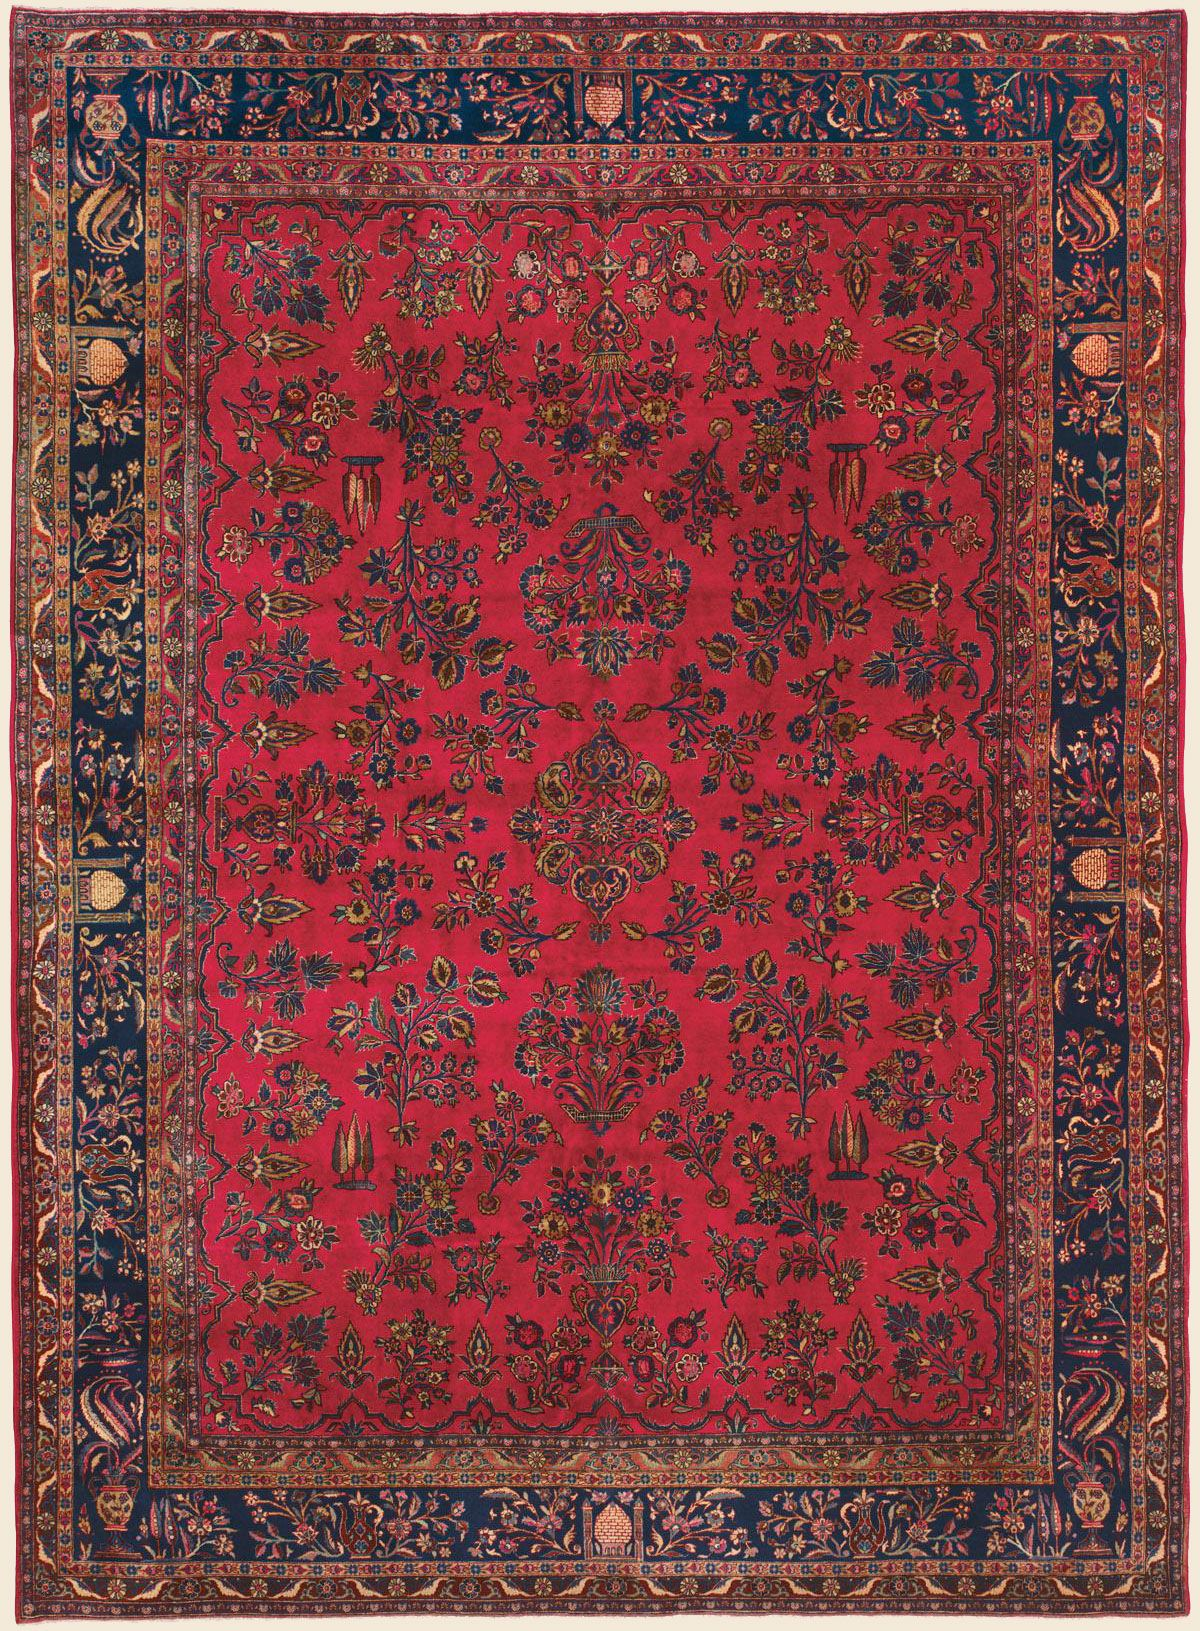 Manchester Kashan 8 8 X 12 1 Circa 1925 Price 15 000